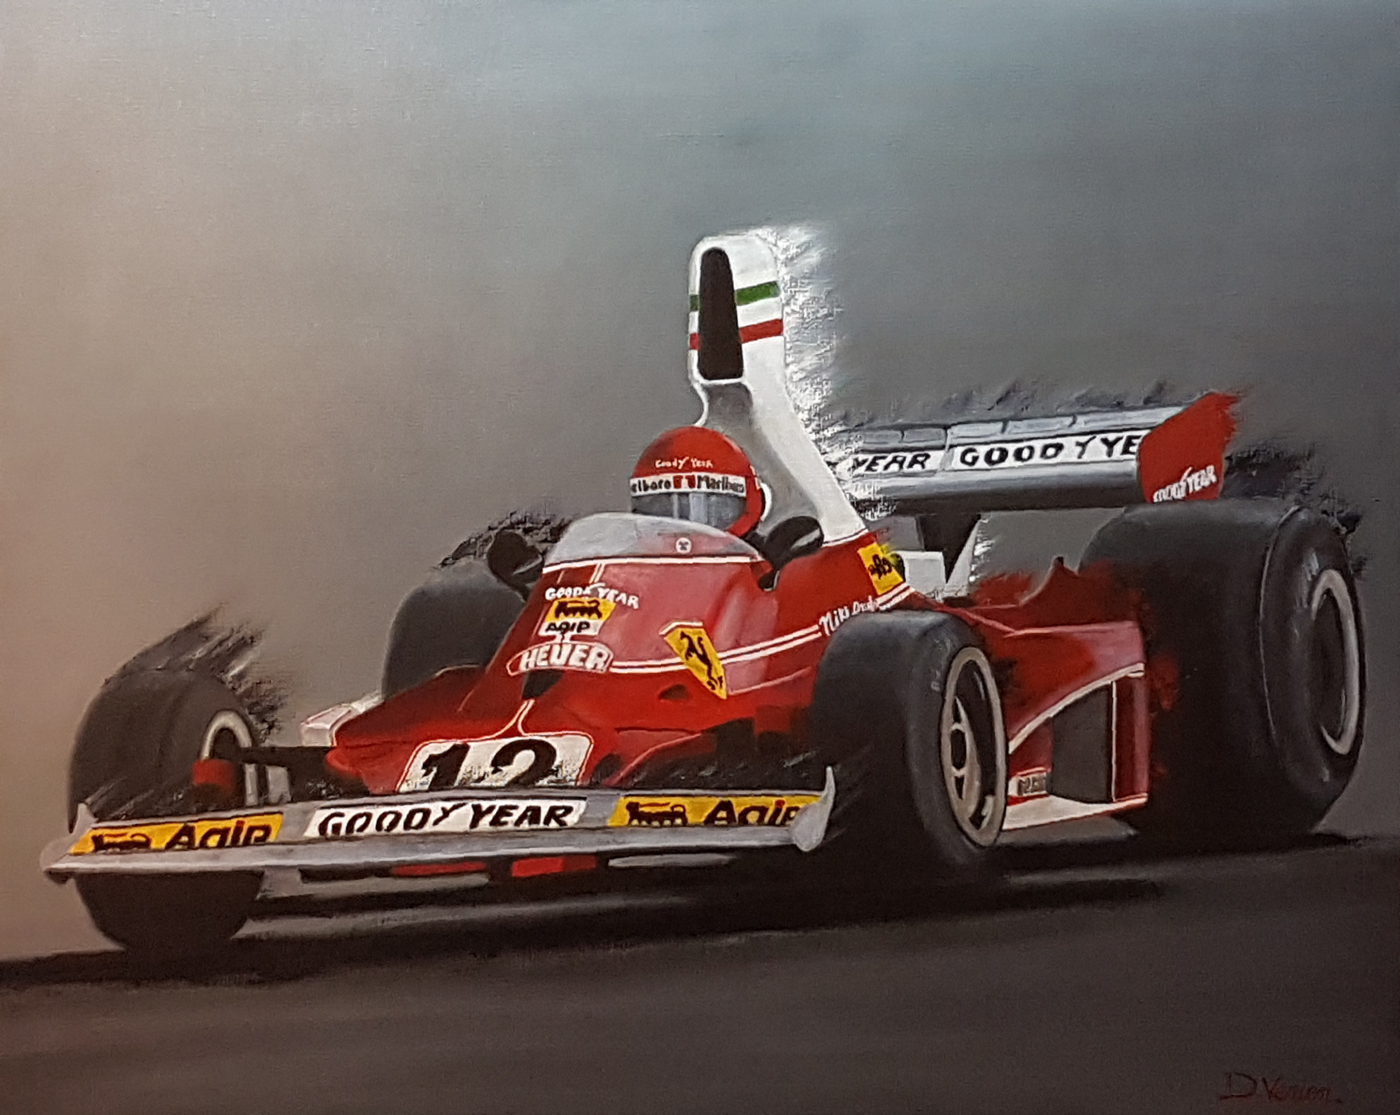 F1, Ferrari, Niki Lauda, peinture F1